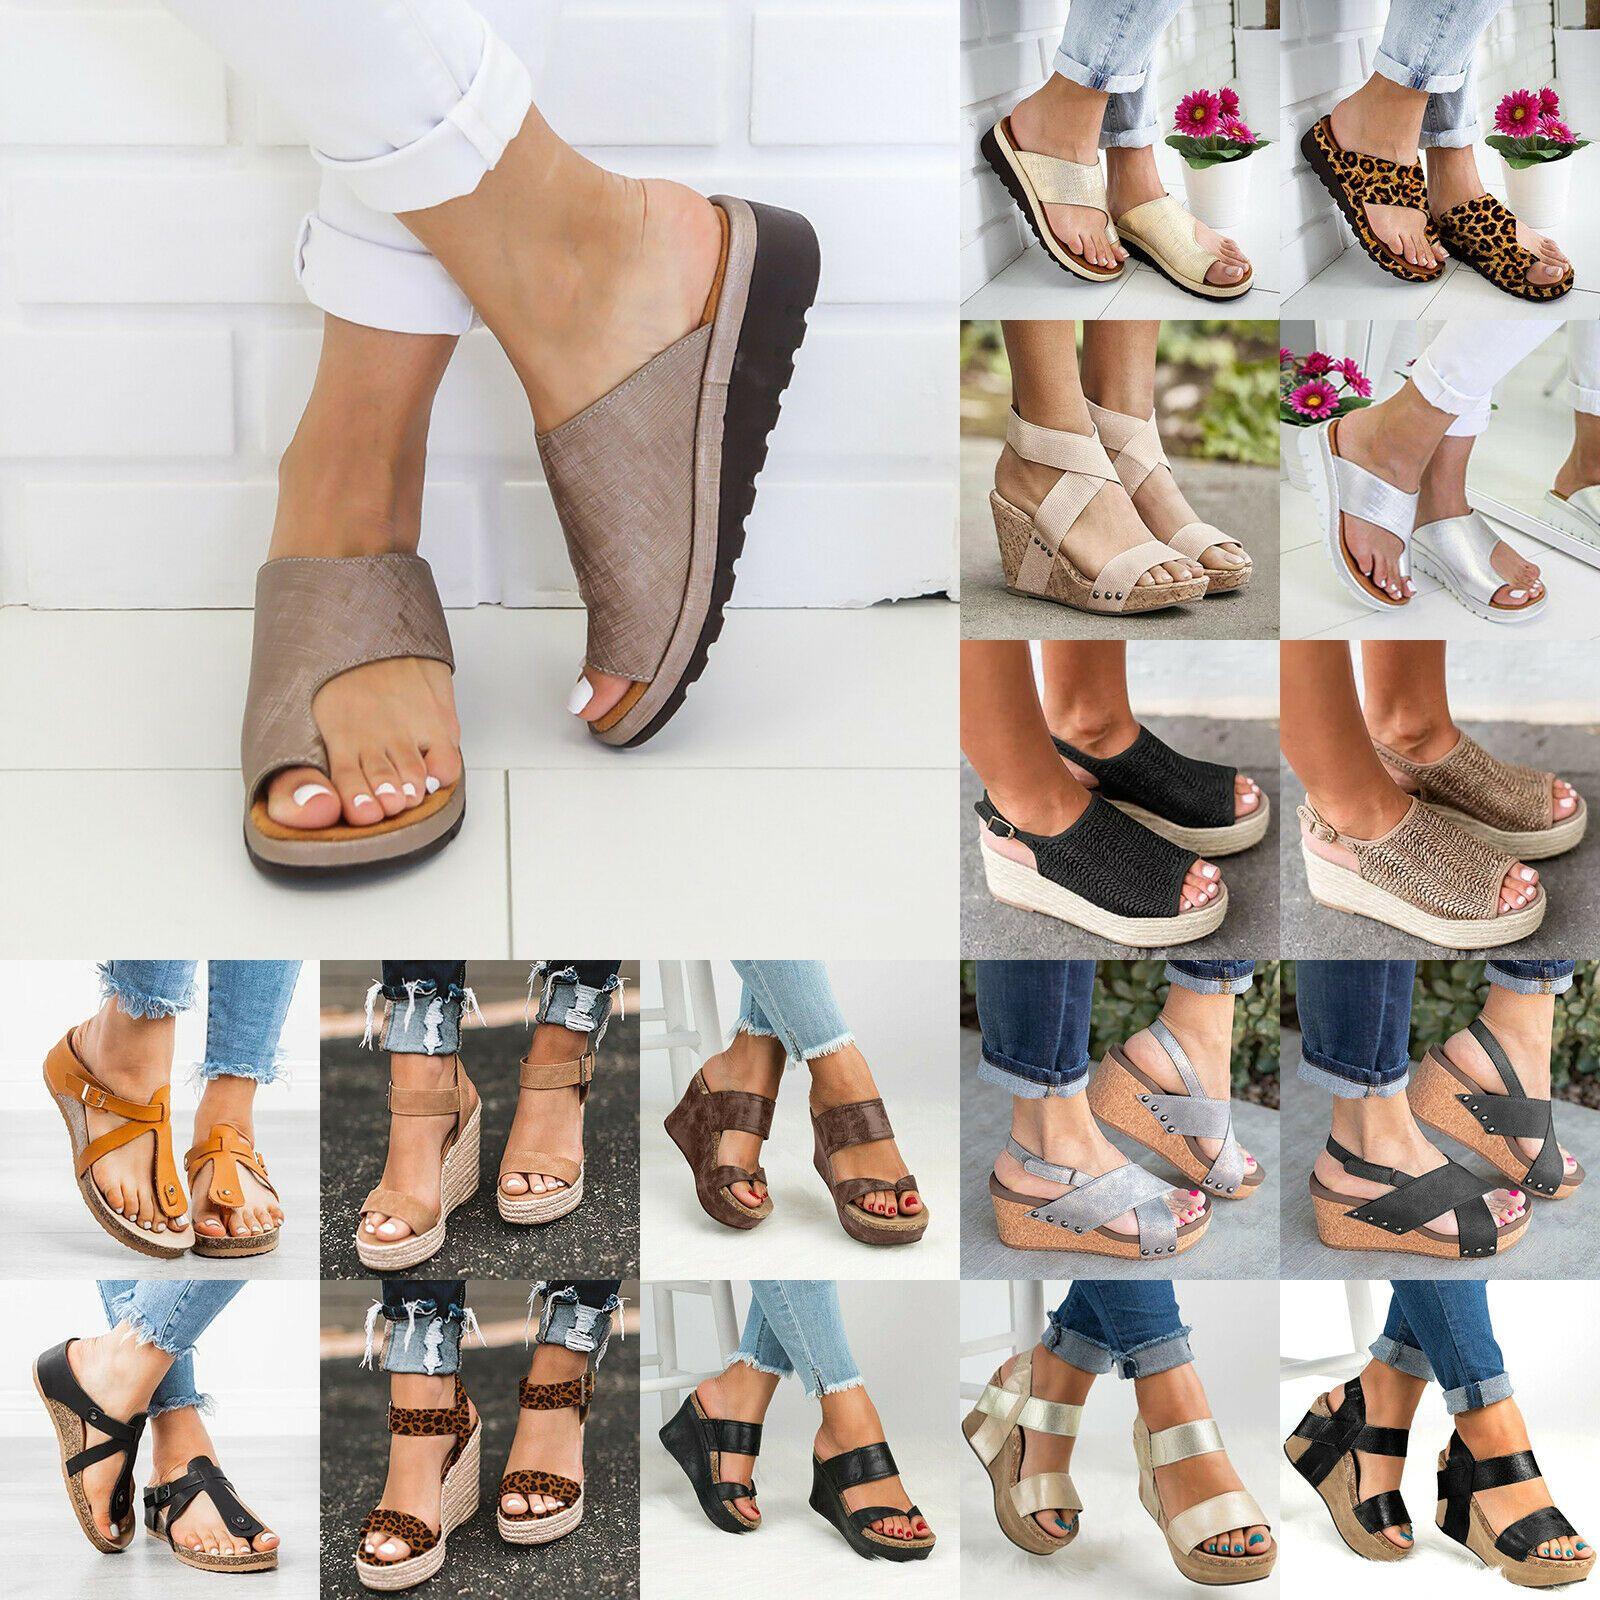 Flops Platform Heels Flip Sandals Beach Keilabsatz Badelatschen Sommer Sandalen